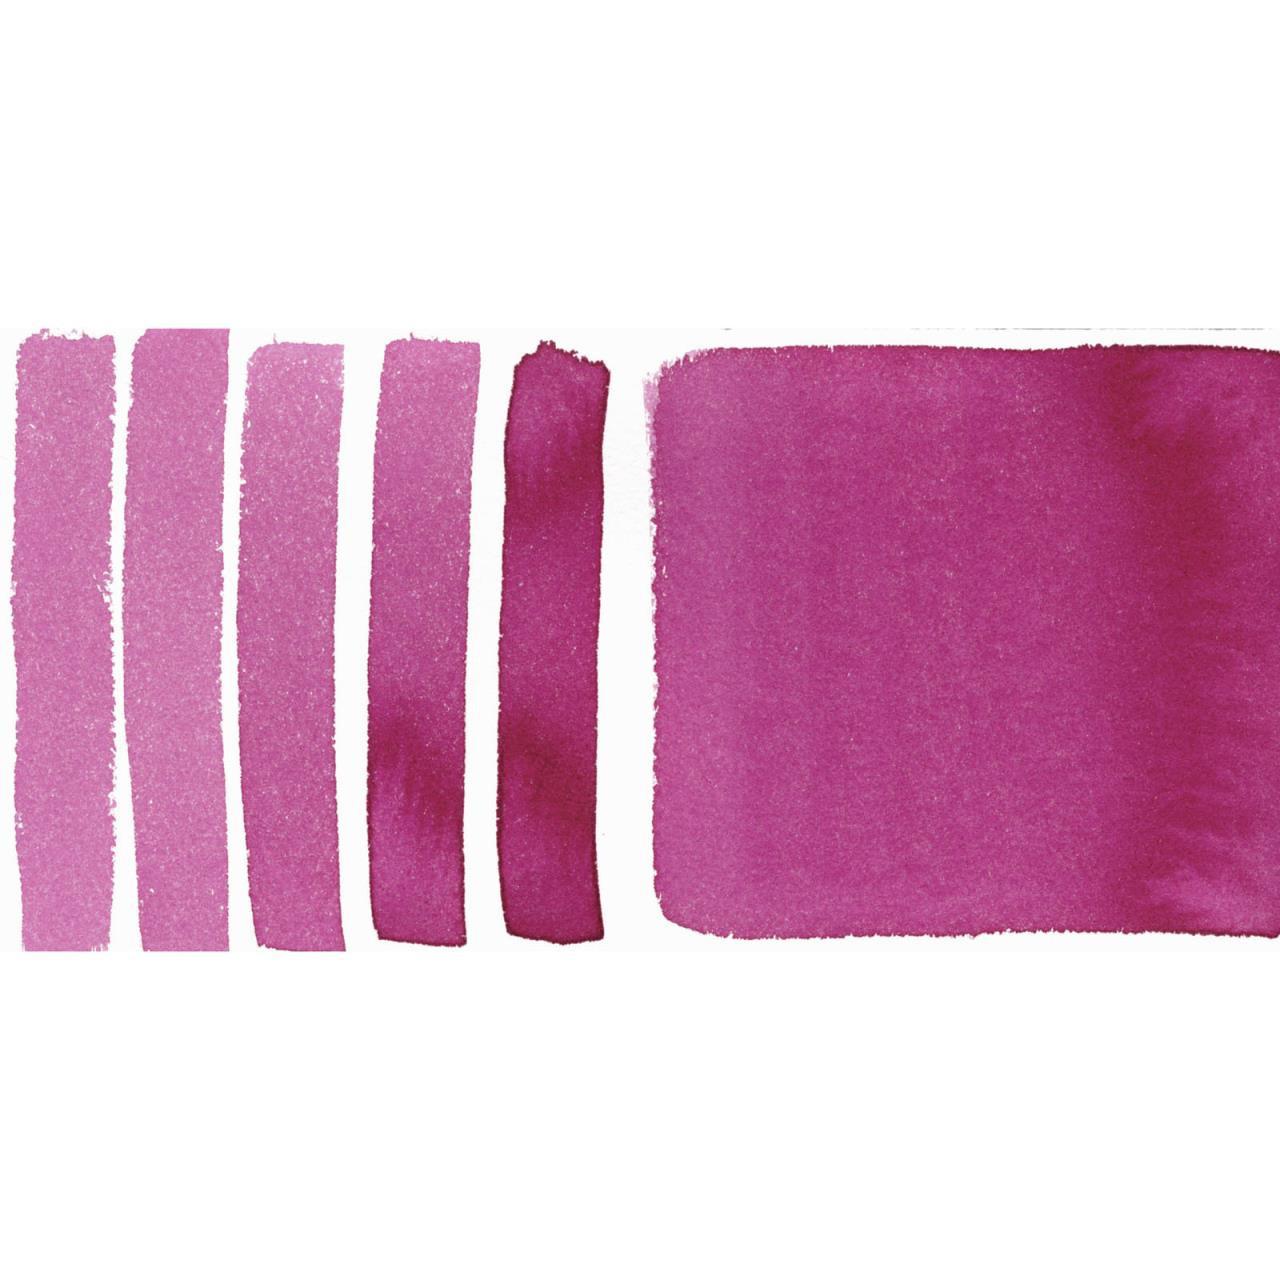 Quinacridone Lilac, DANIEL SMITH Extra Fine Watercolors 15ml Tubes - 743162033386